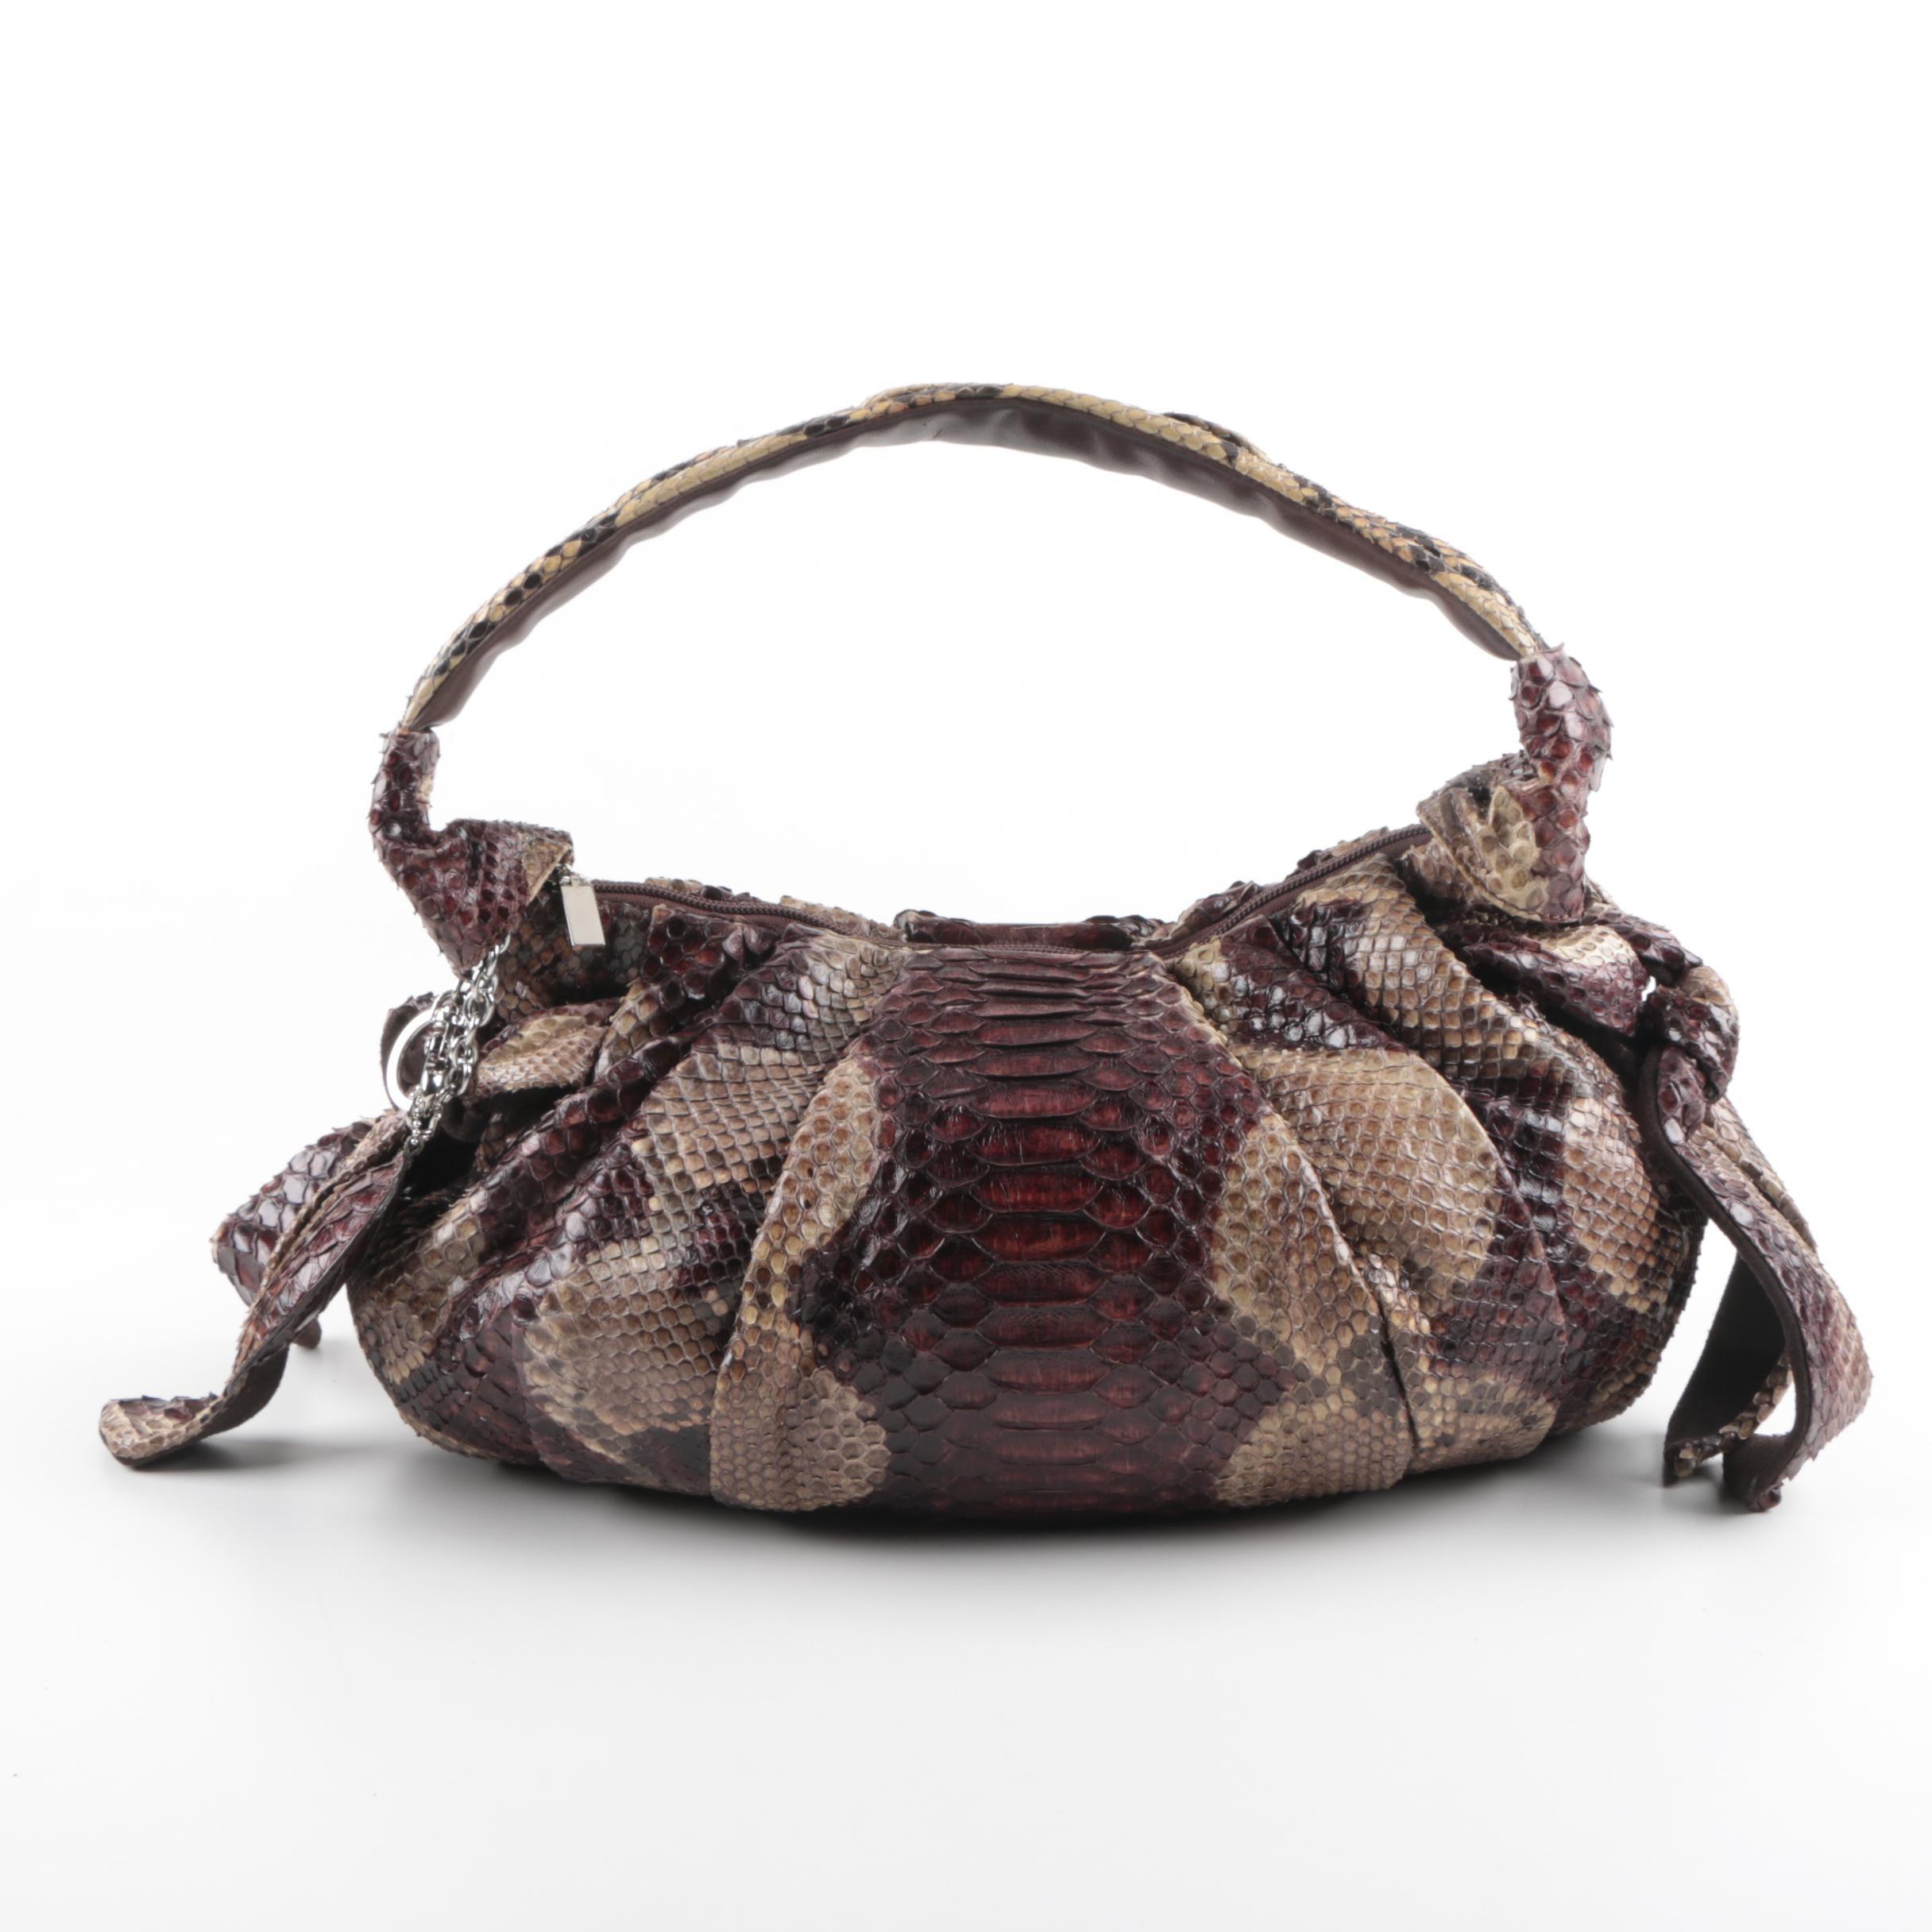 Struzzo Paolo Bentini Python Skin Handbag